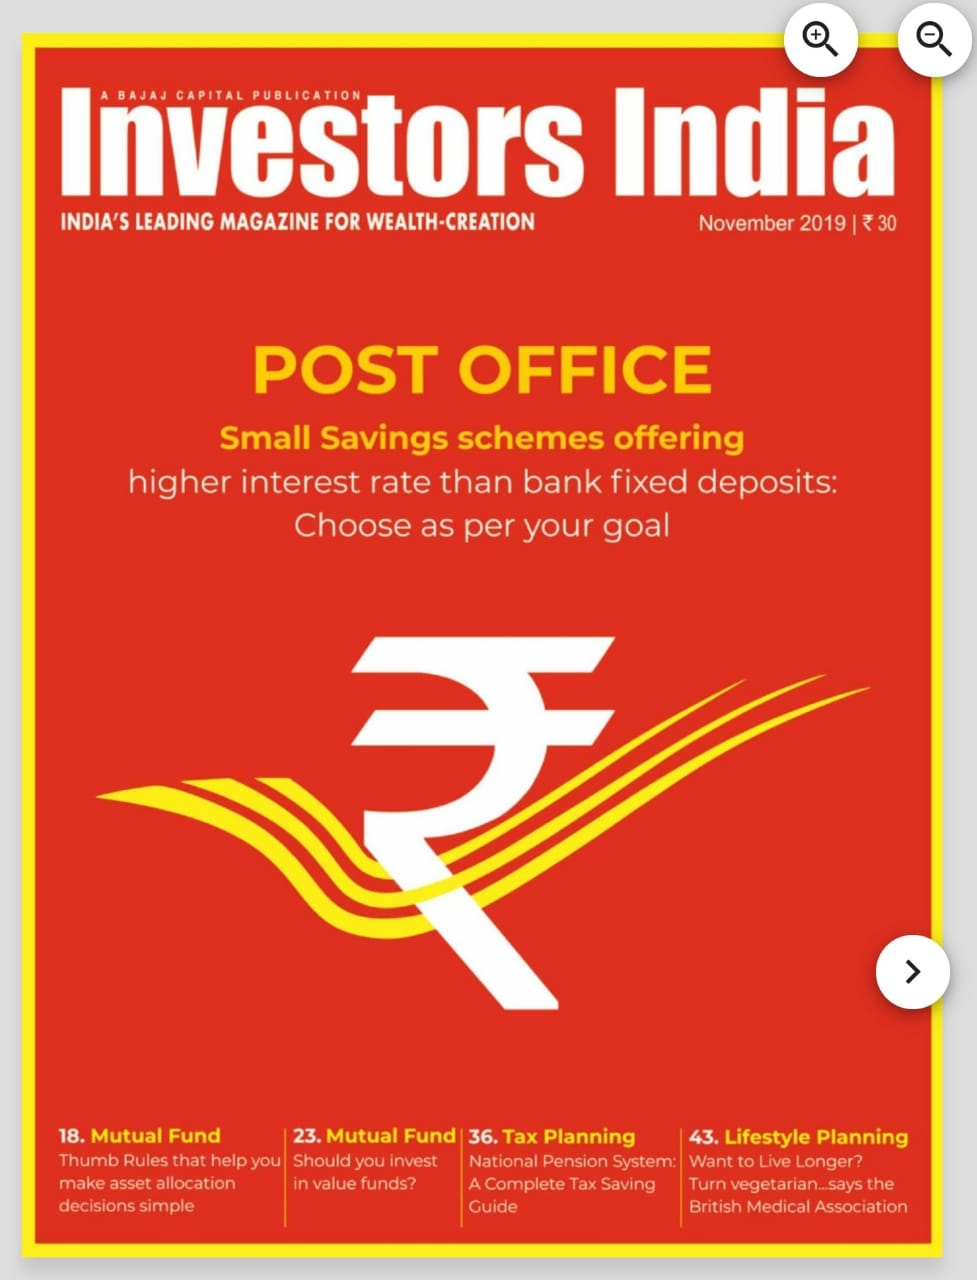 investors india 2019 edition